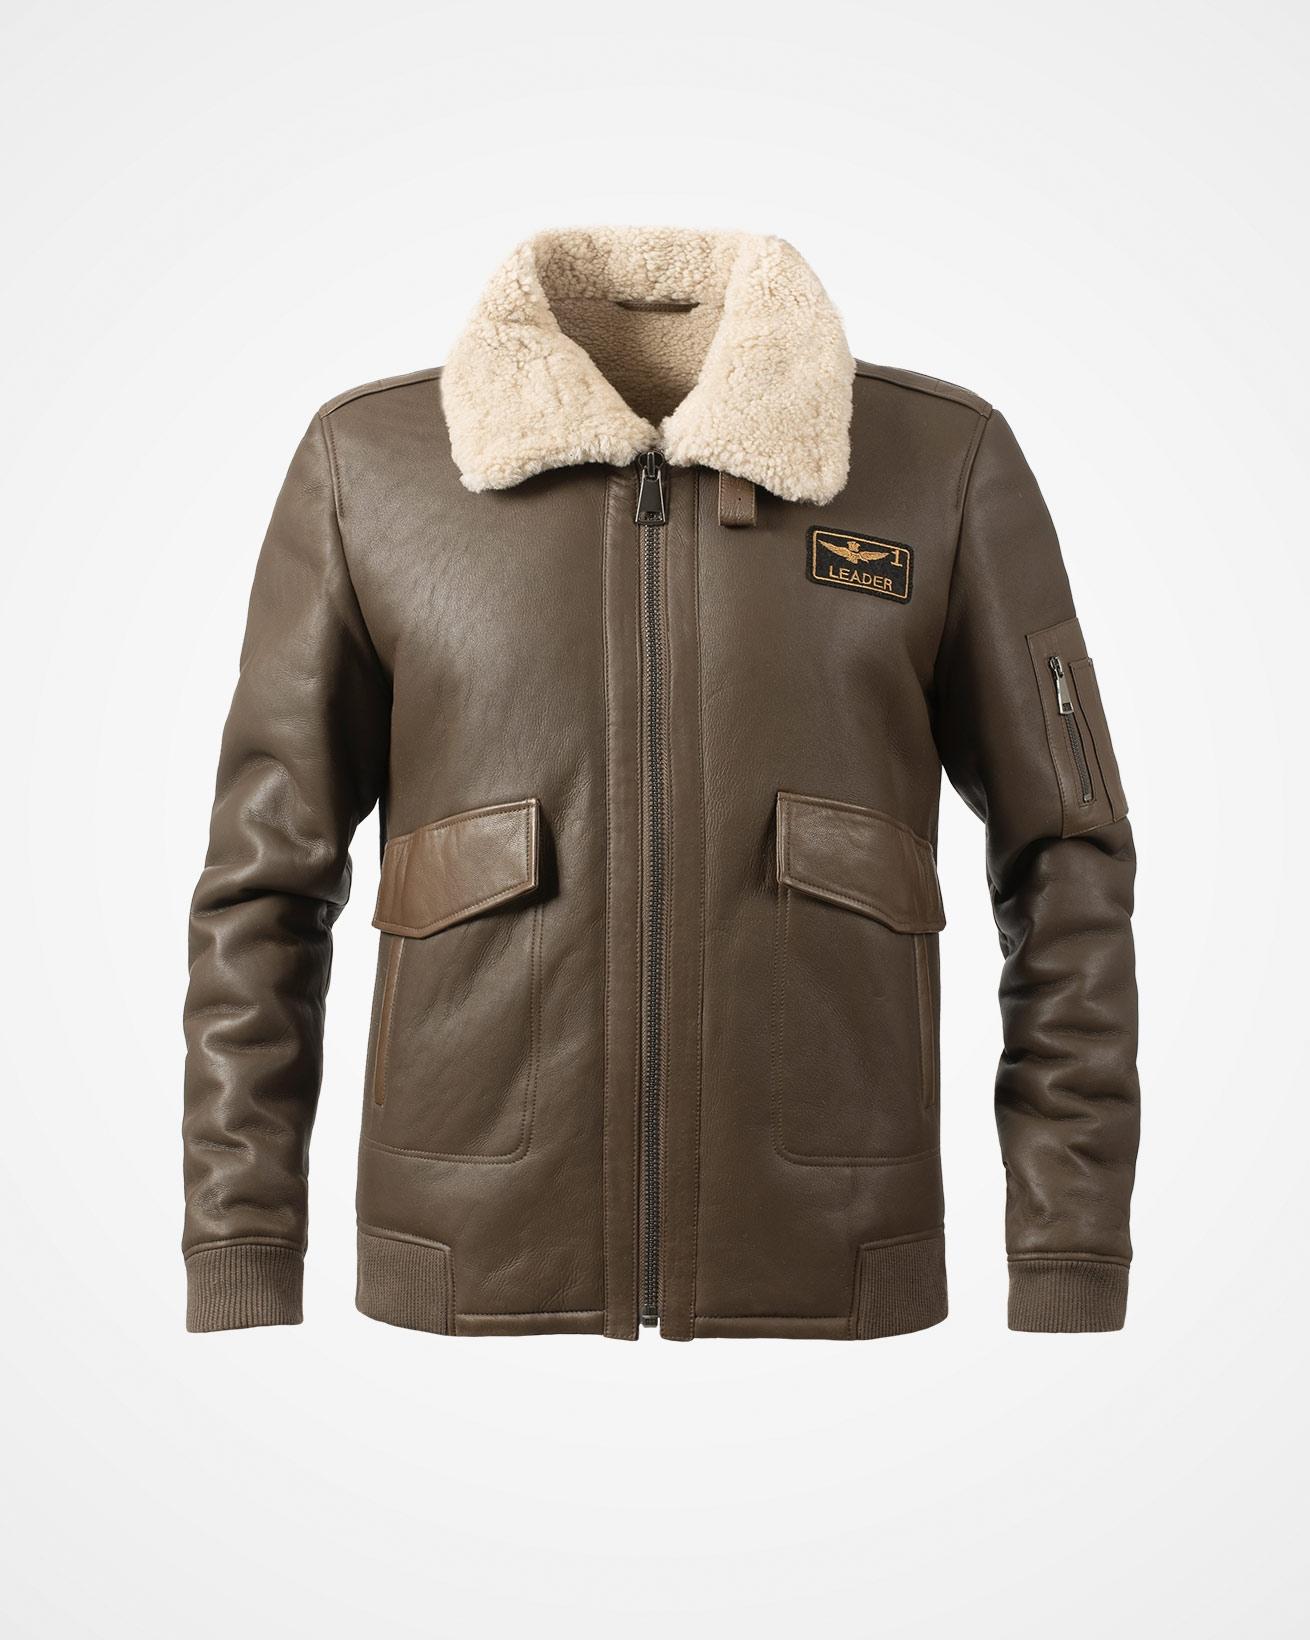 7740_mens-sheepskin-maverick-jacket_tanners-brown_front.jpg